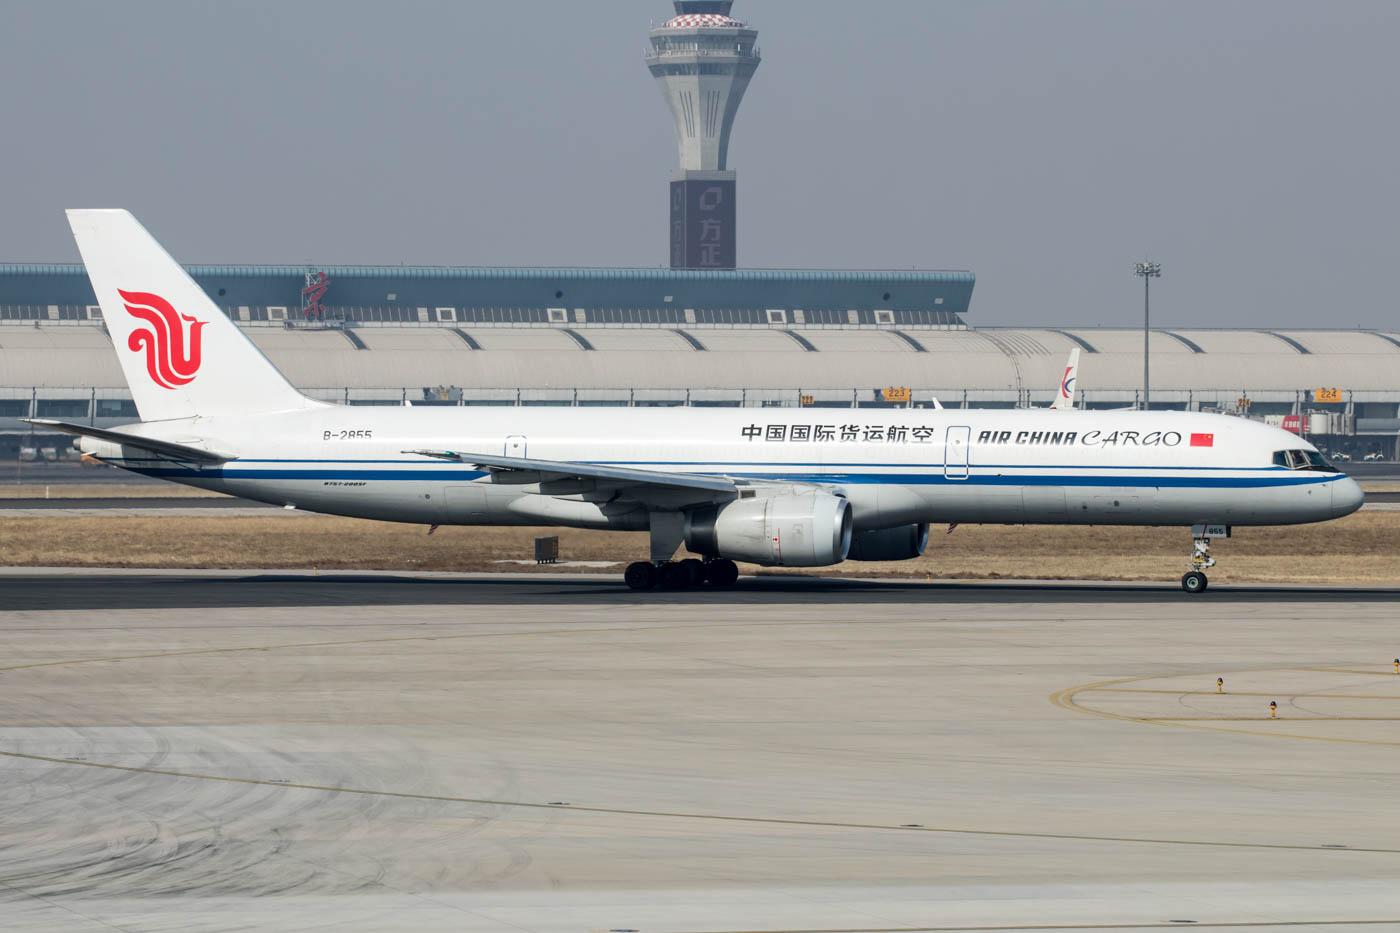 Air China Cargo 757-200F